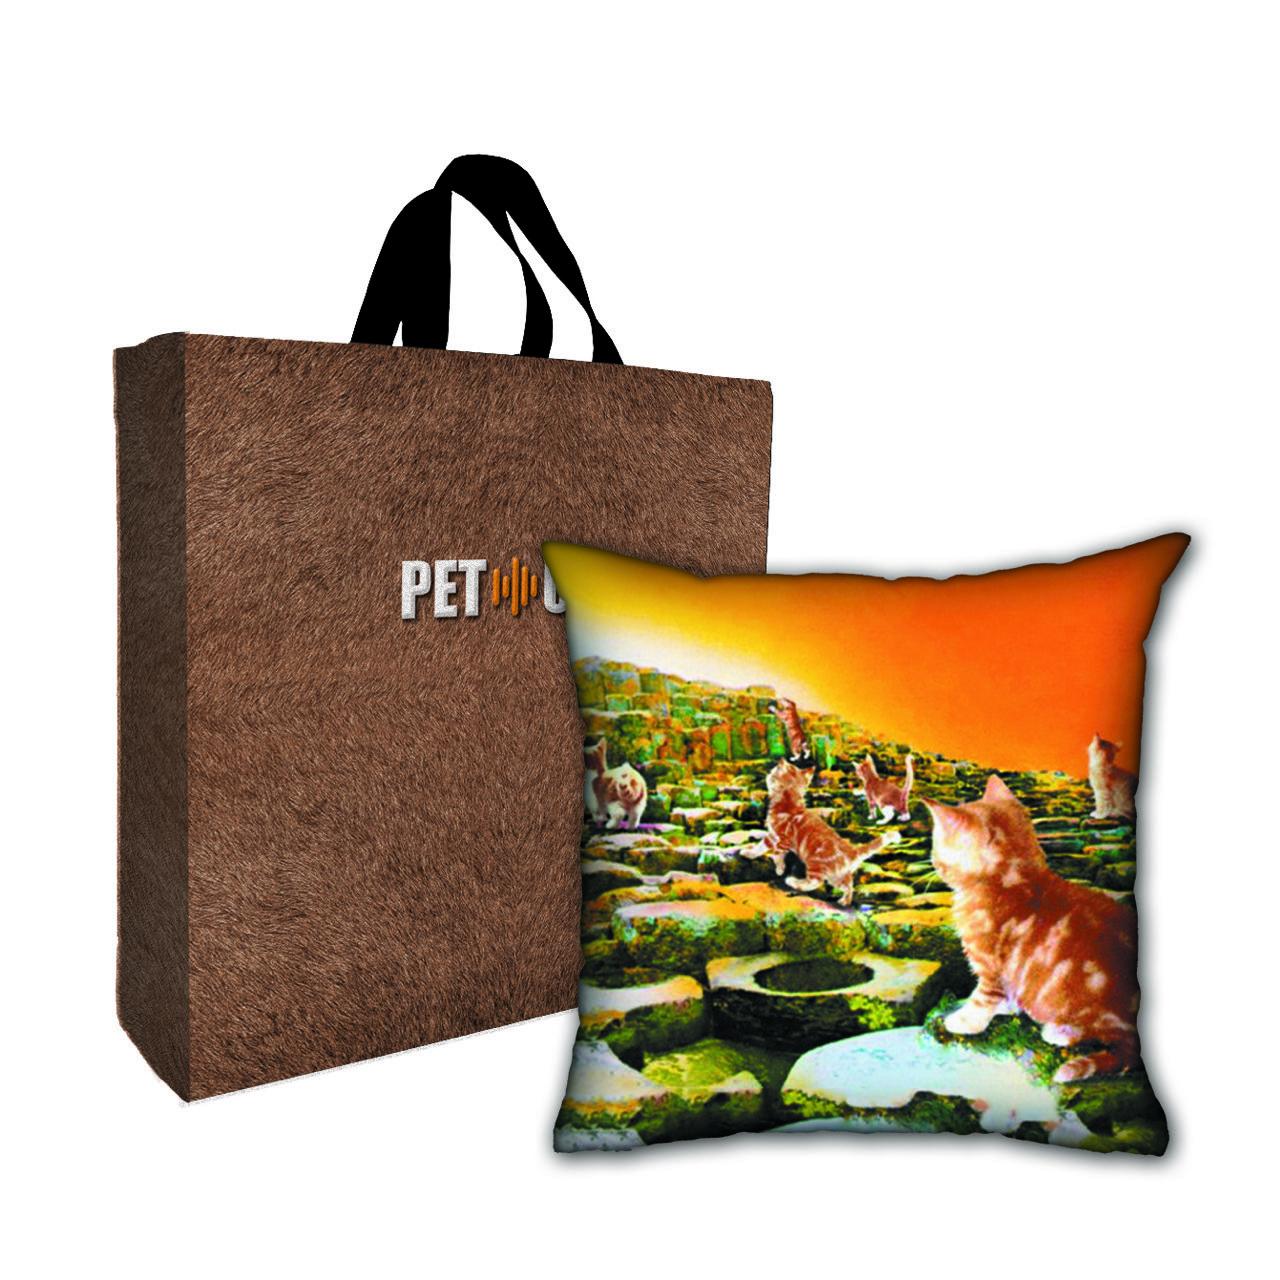 Kit Almofada & Sacola Bege Pet Use - Houses of the Cats - Gatos